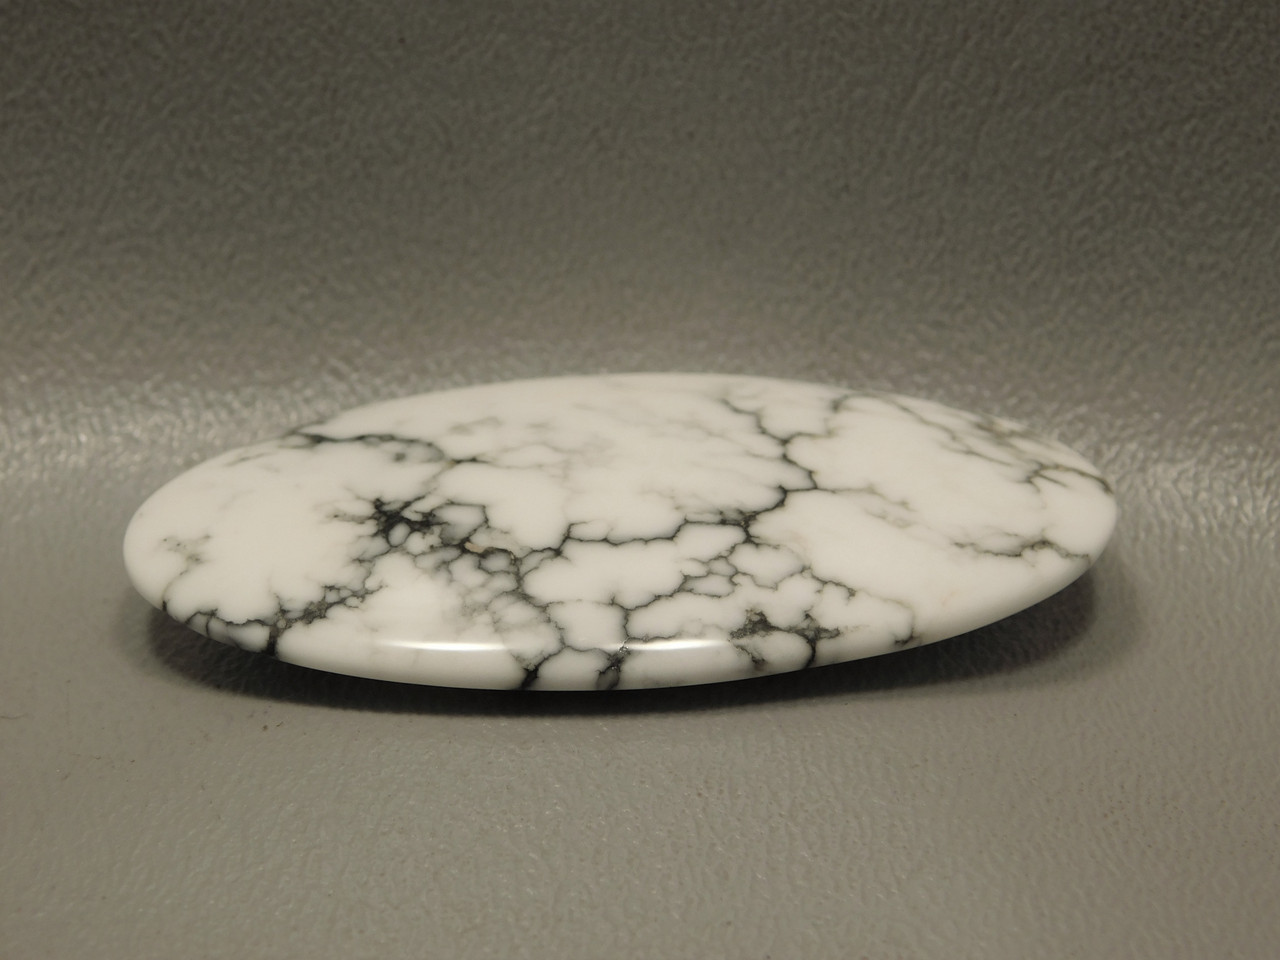 Cabochon Howlite Oval White Gray Stone Semi Precious Gemstone 13